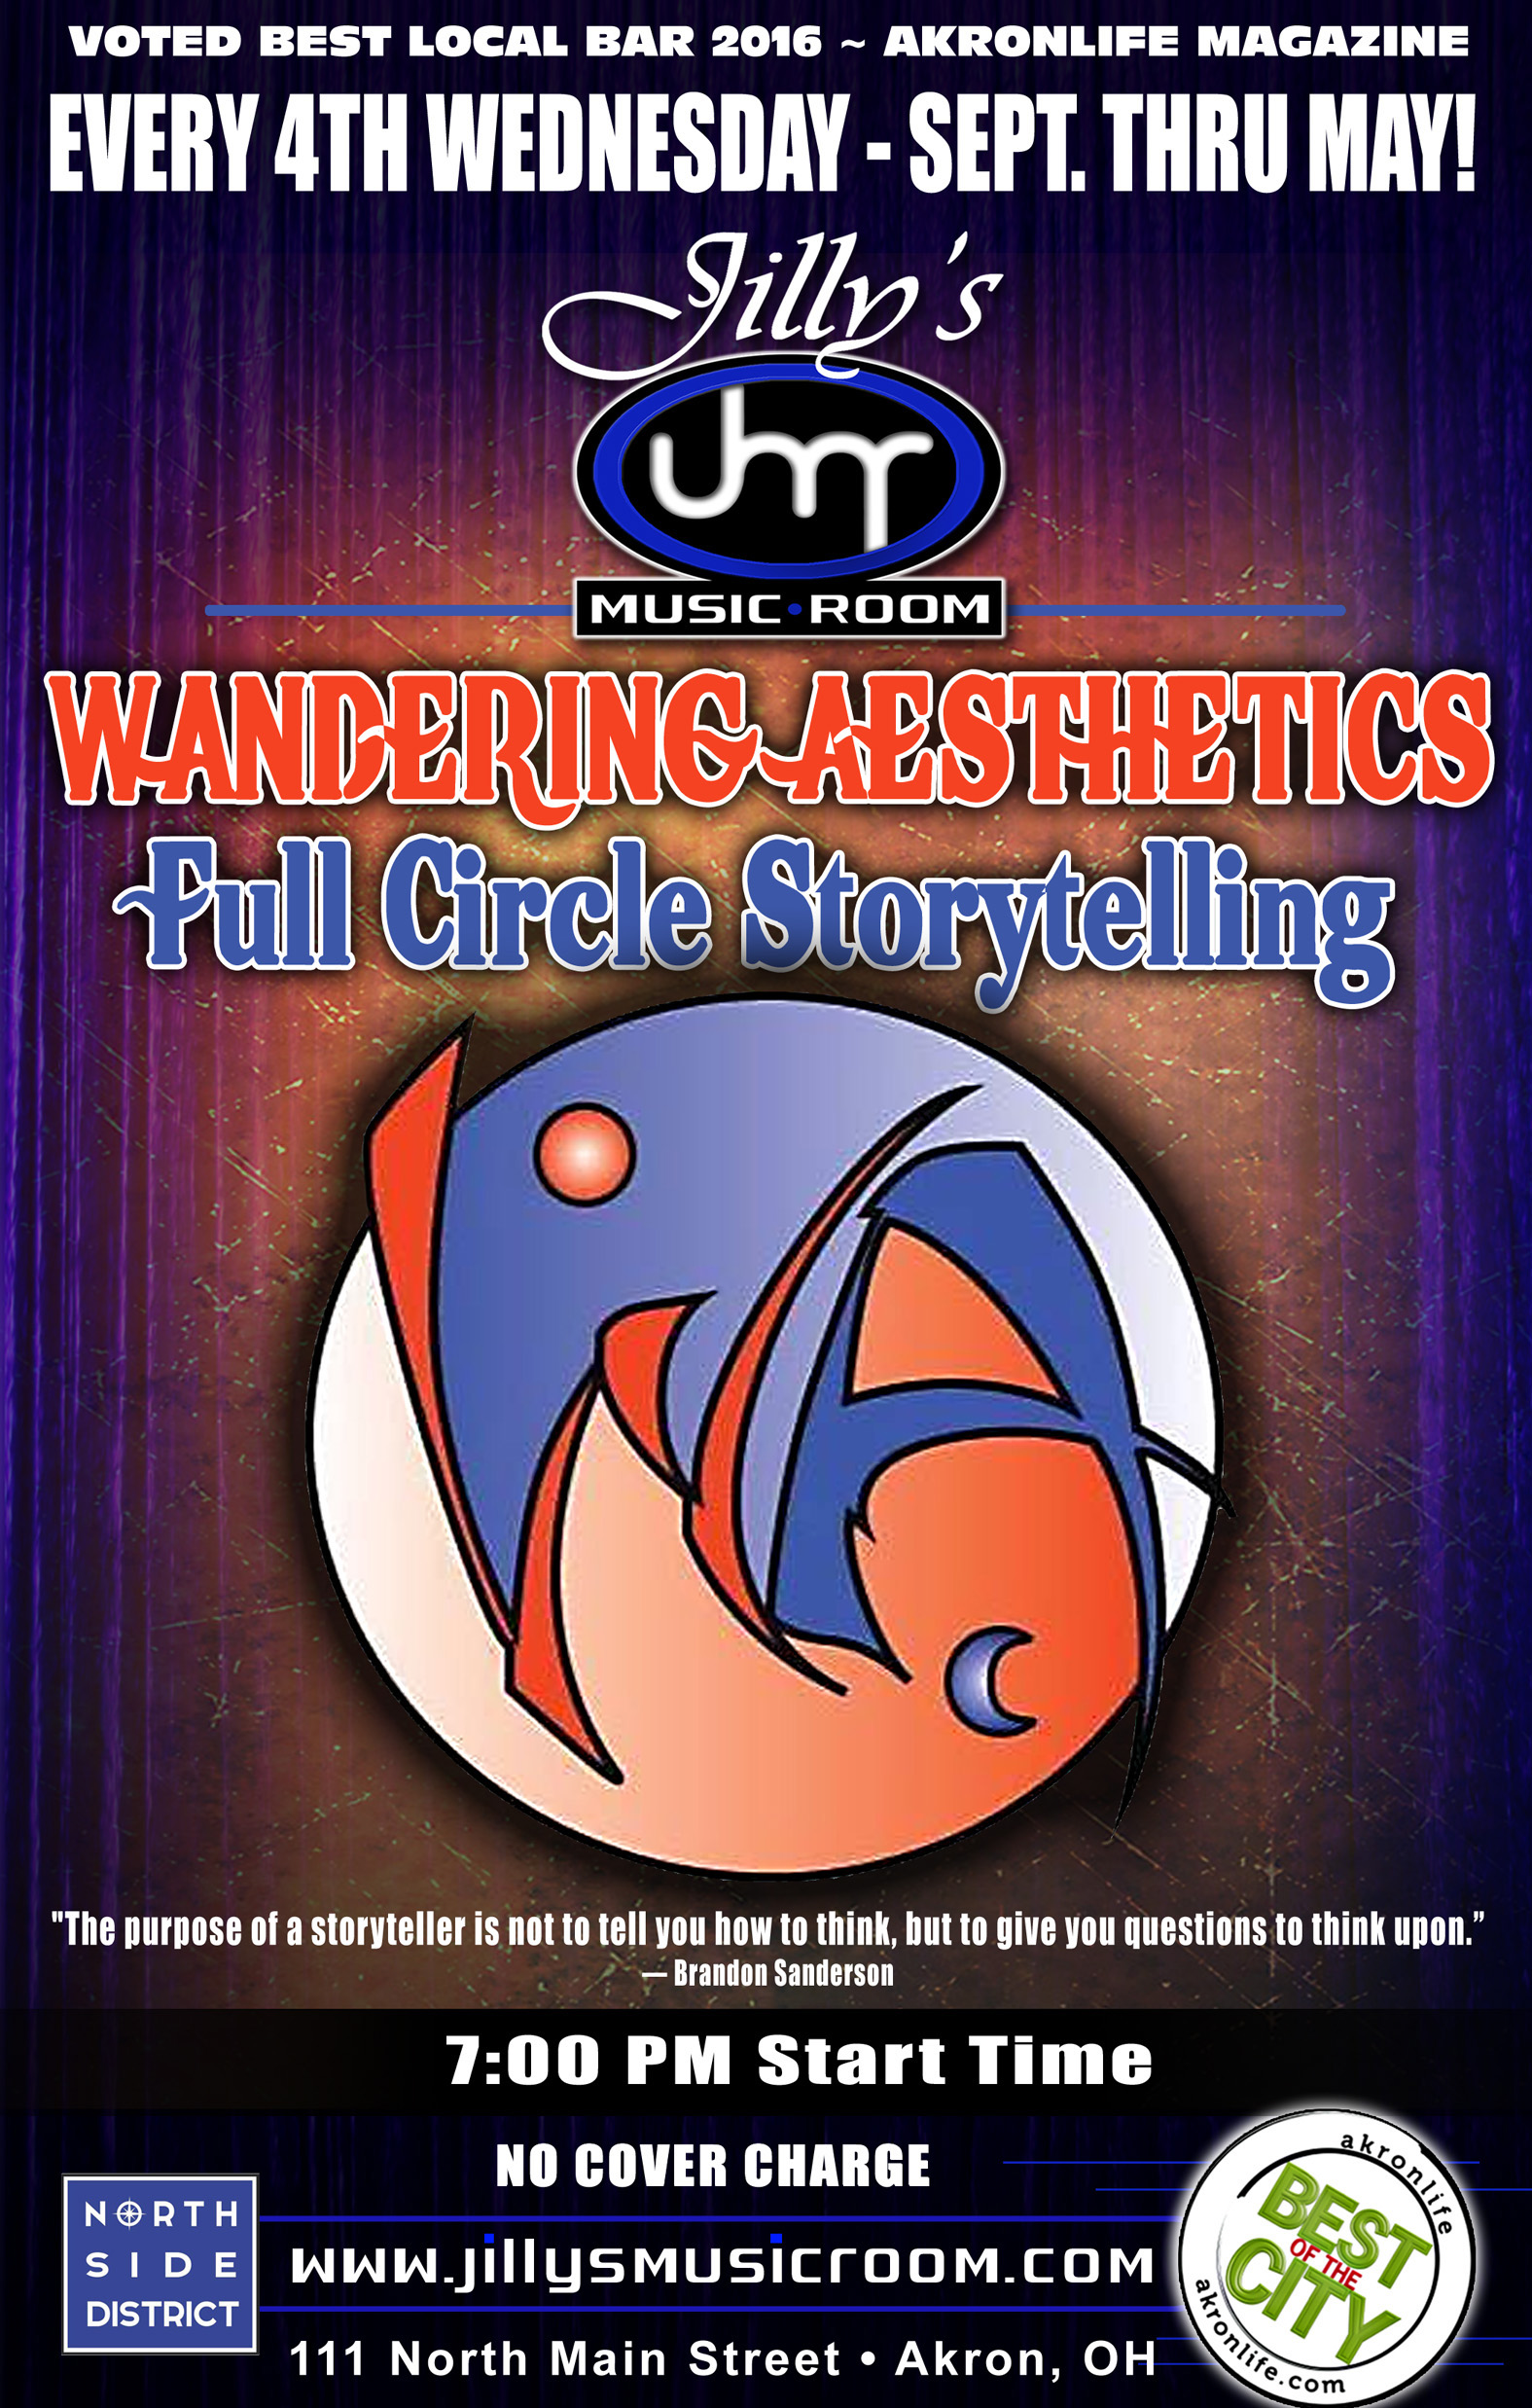 JMR - Wandering Aesthetics Monthly Poster 1-1-1.jpg